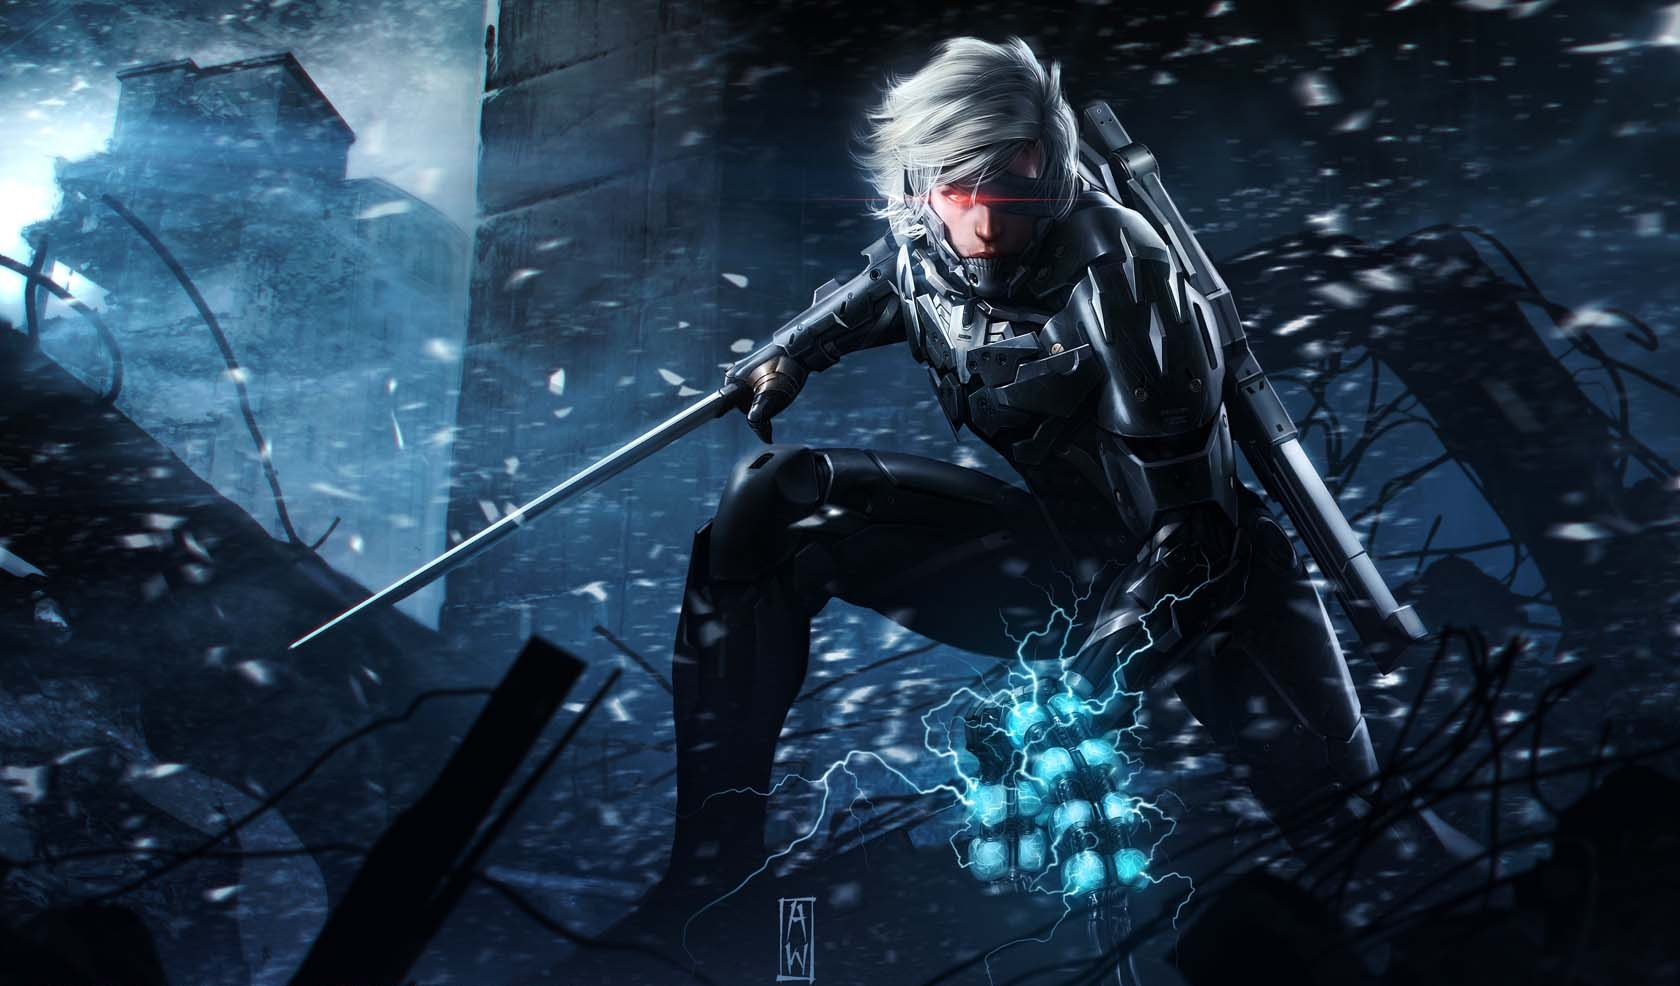 TGS 2012: Metal Gear Solid Rising: Revengeance Trailer